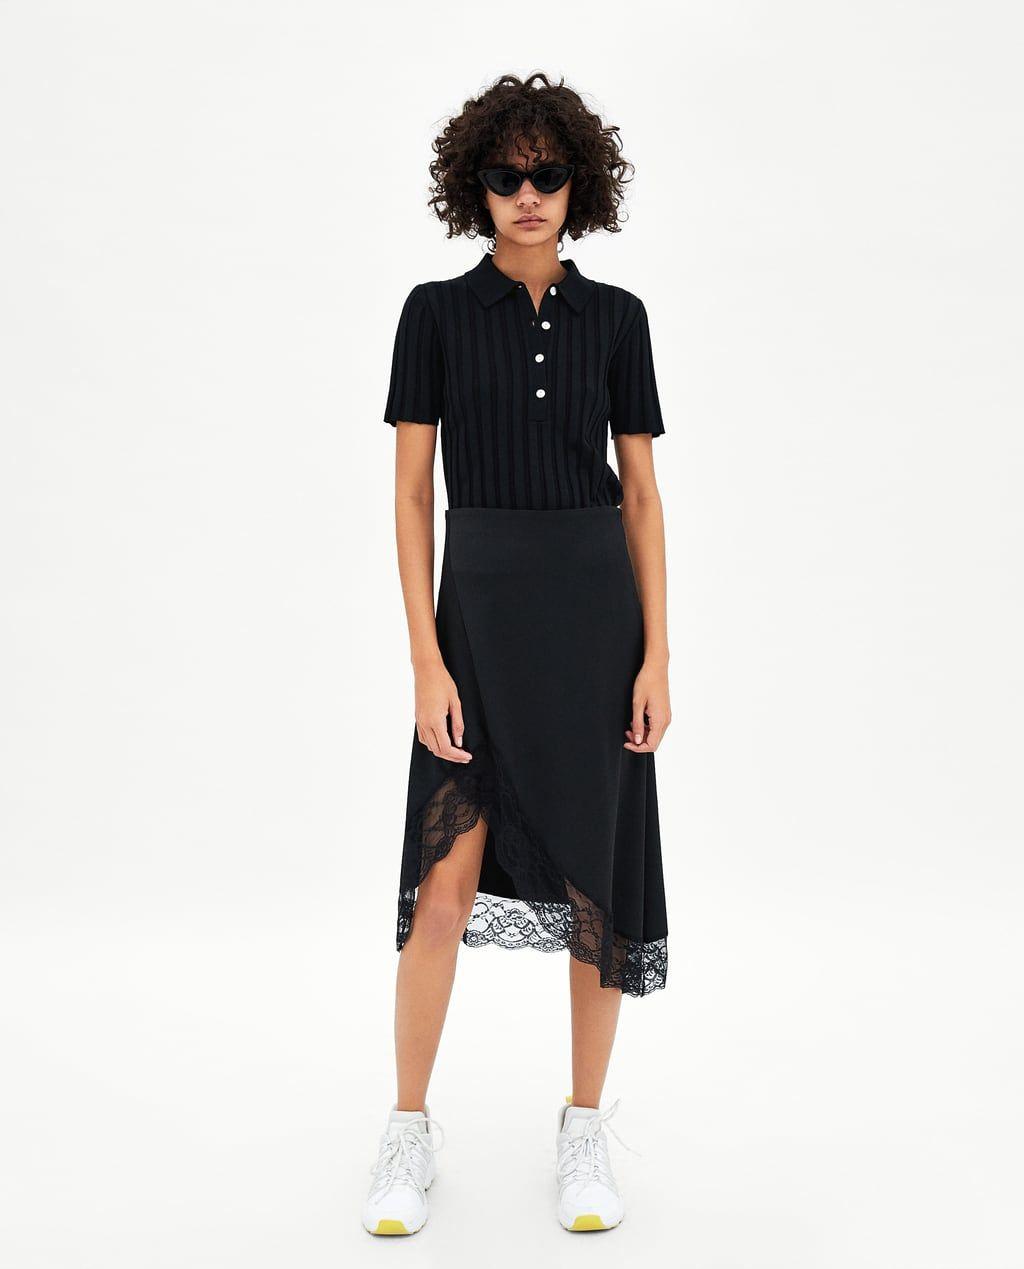 c83a6da4 Image 1 of SATIN MIDI SKIRT from Zara | Want it.. | Satin midi skirt ...